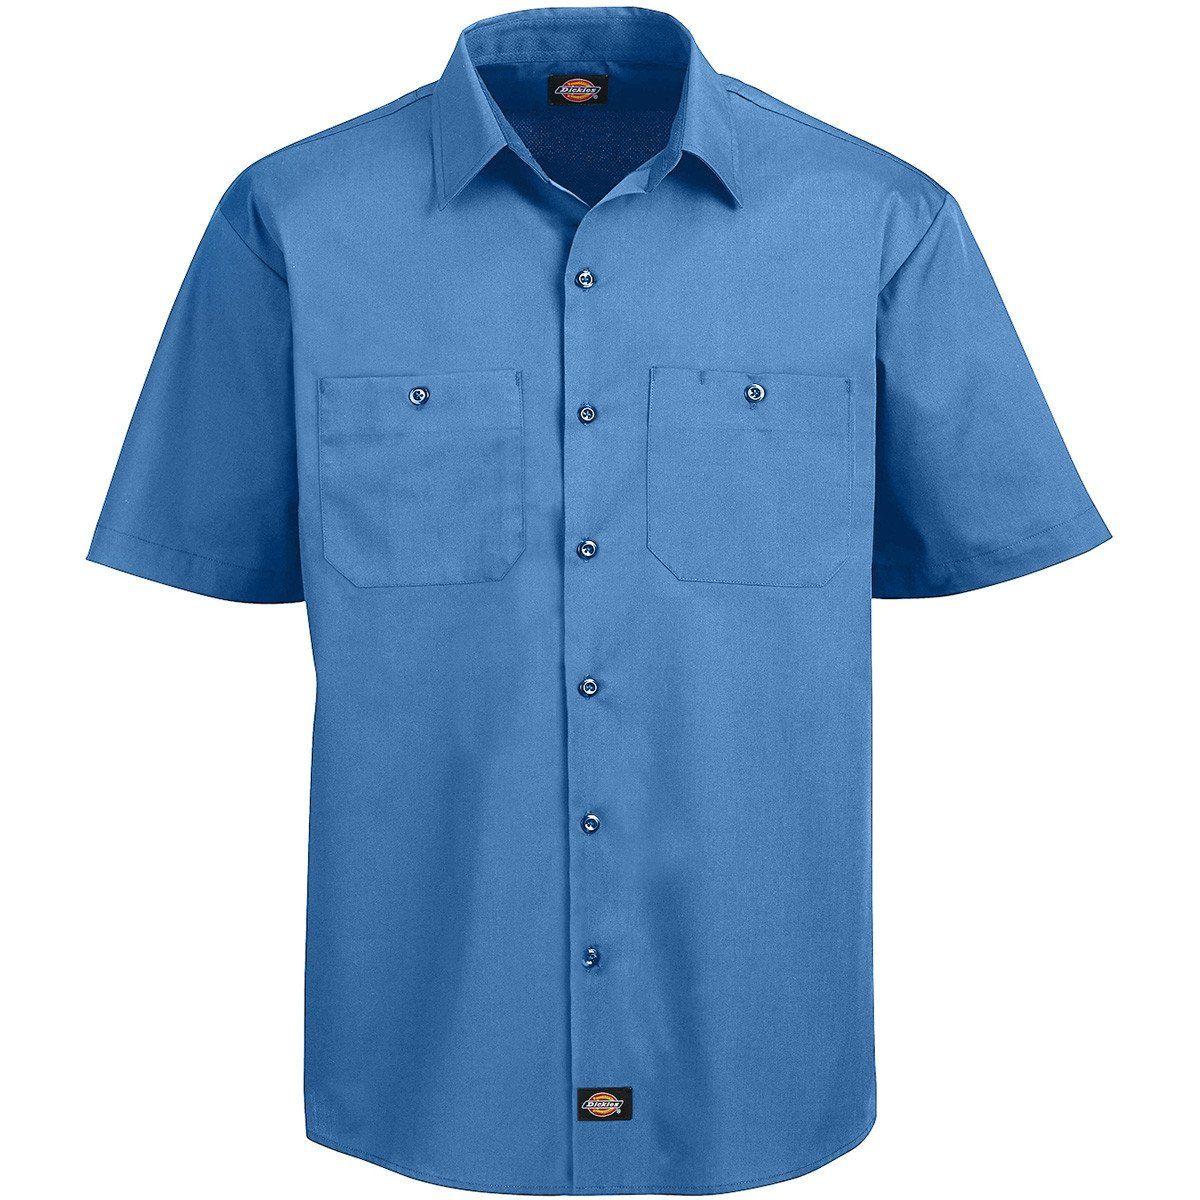 37a5b552 Light Blue Short Sleeve Work Shirts – EDGE Engineering and ...